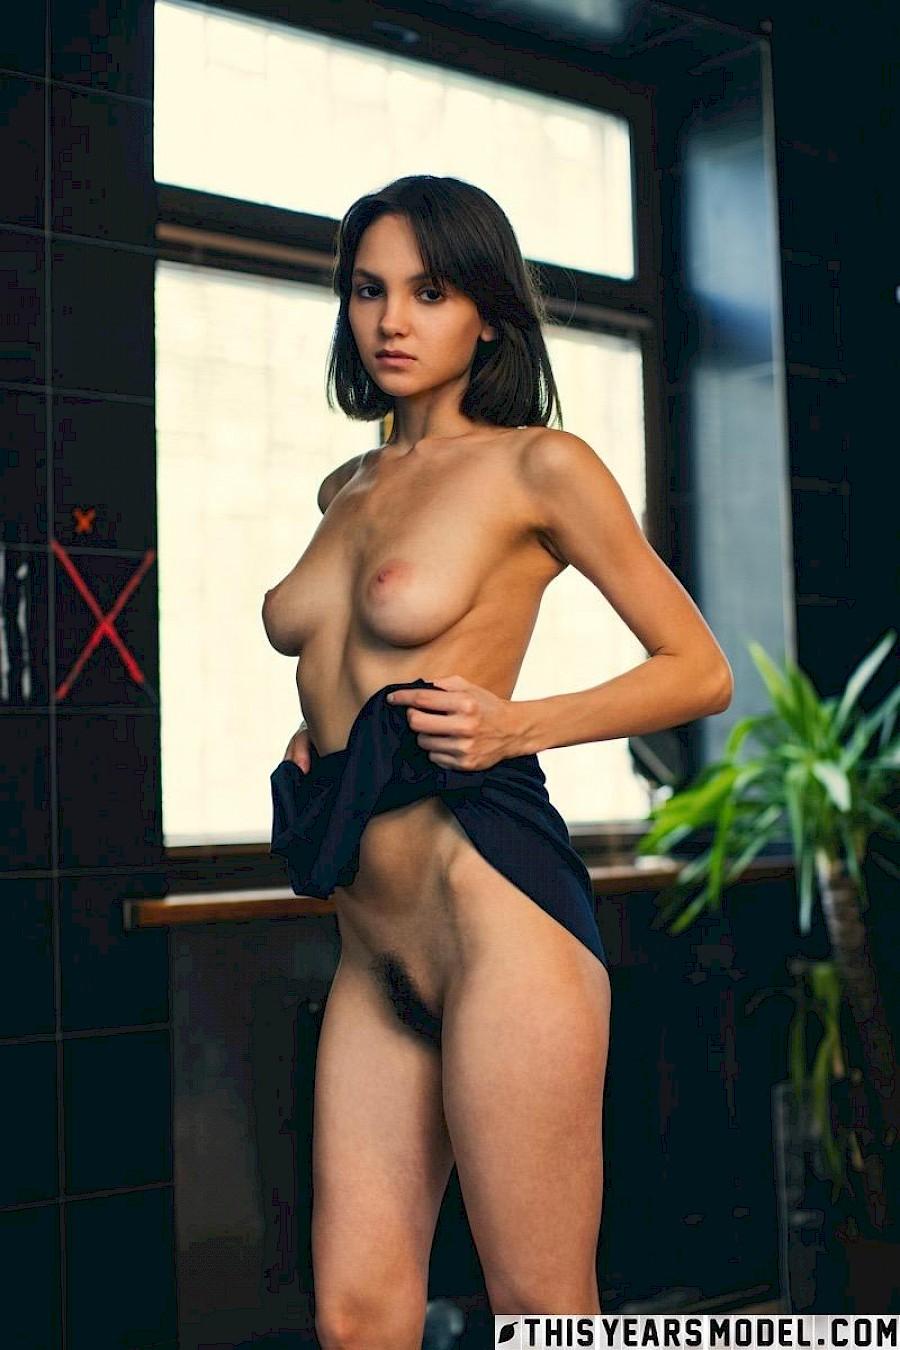 Babe Lara Porn Star big boobs babe lara masier shows you her gorgeous nude body